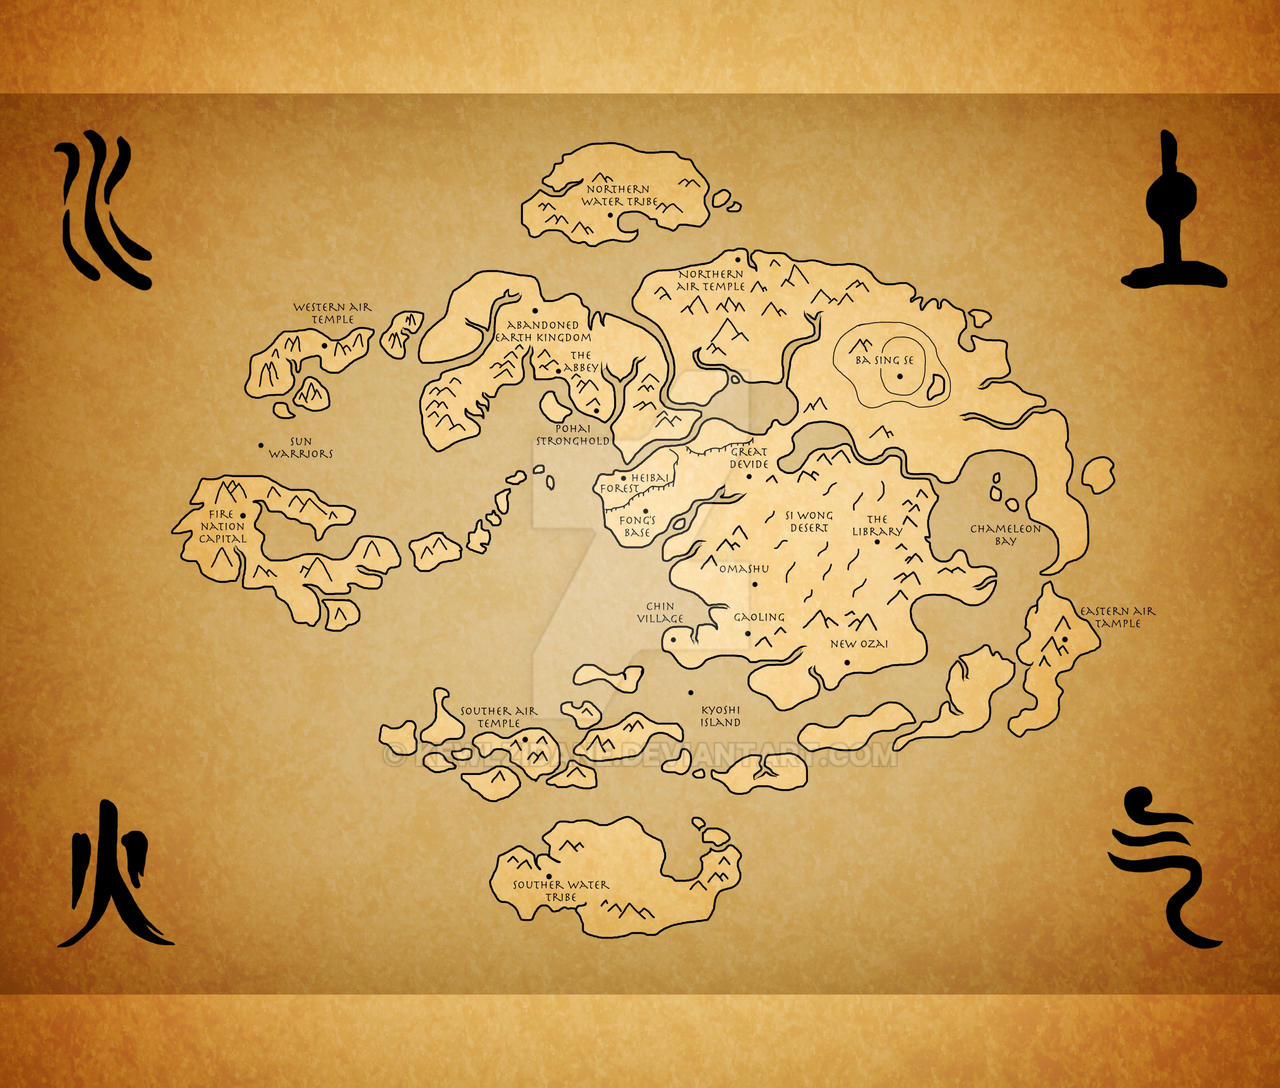 Avatar Last Airbender World map by Kewlzidane on DeviantArt